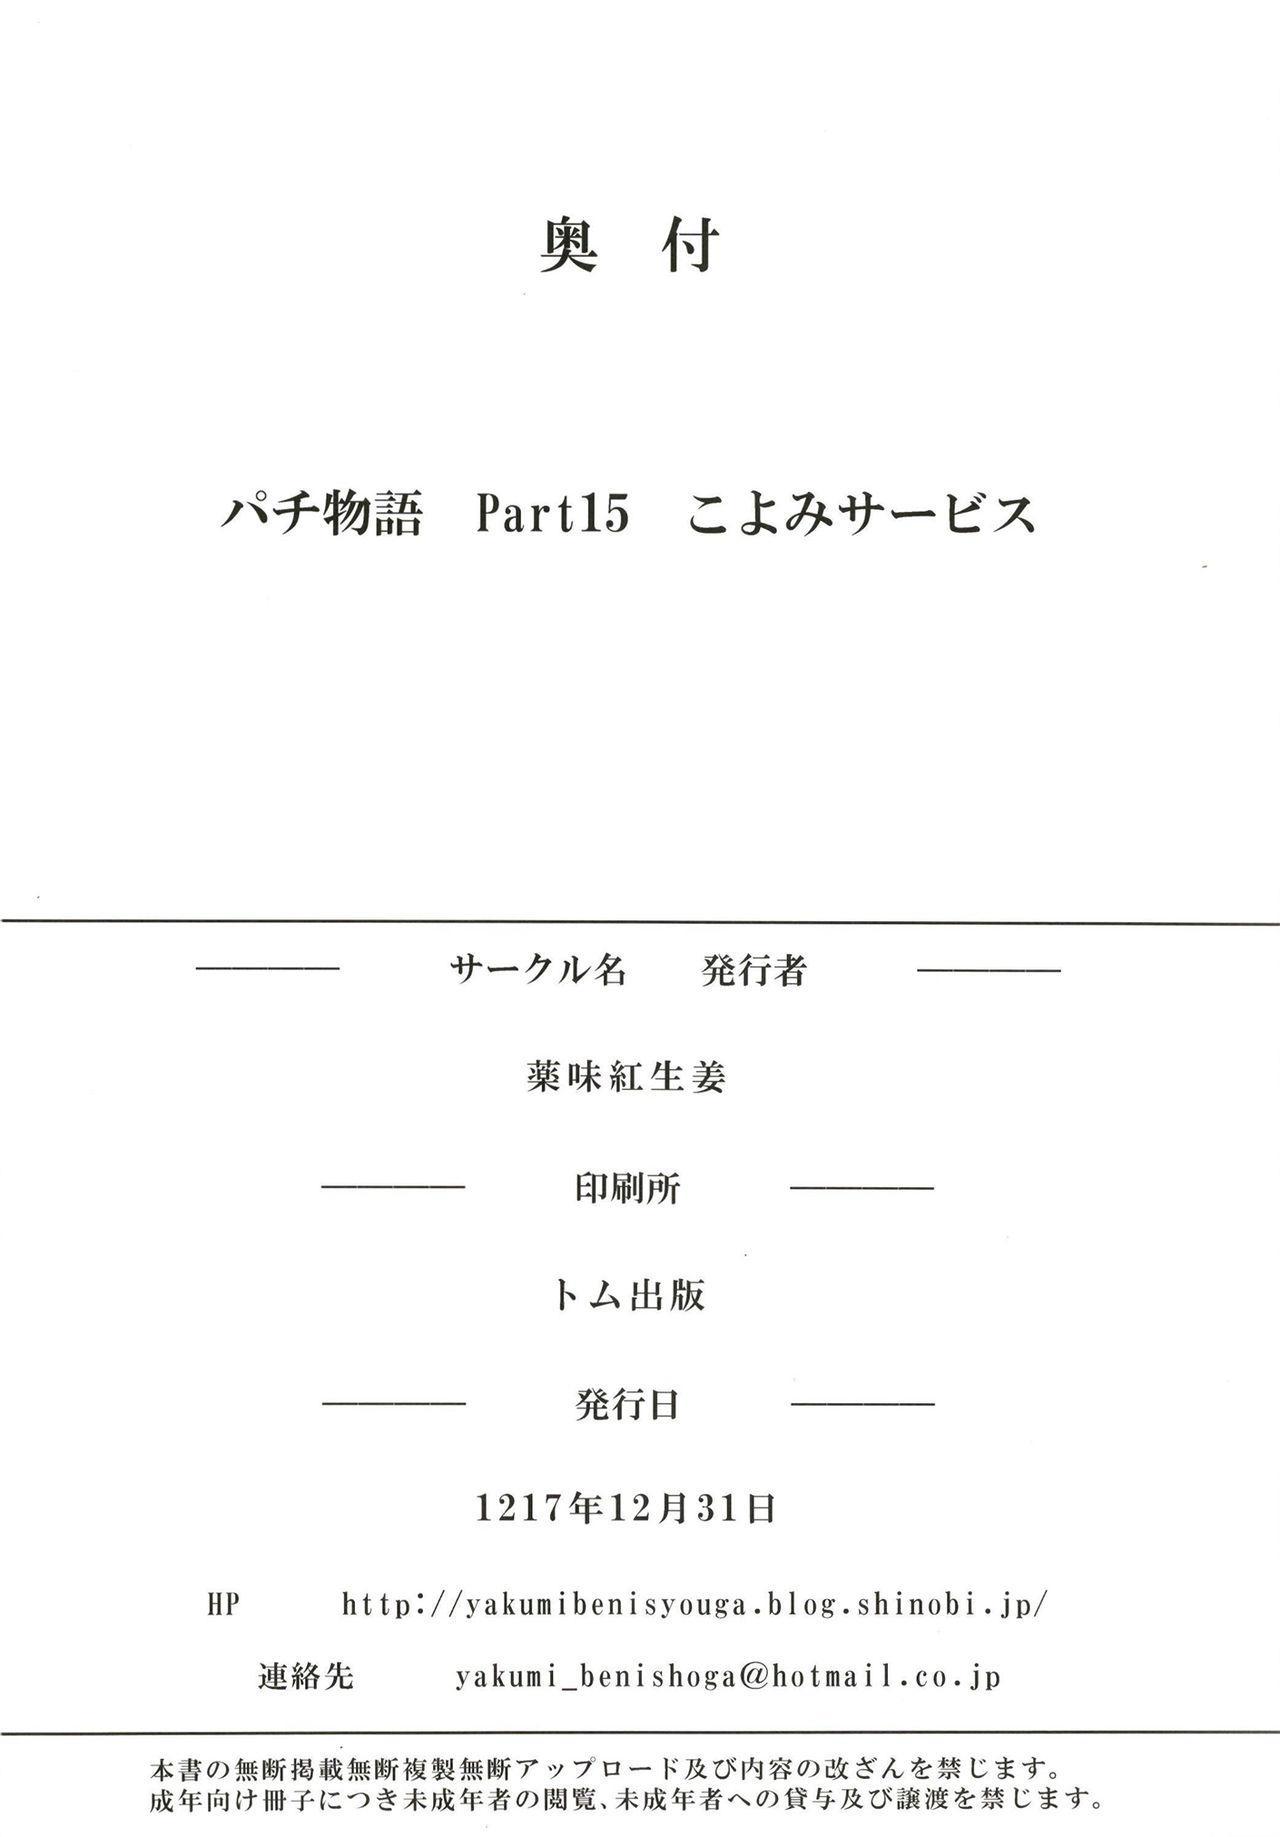 Pachimonogatari Part 15: Koyomi Service 24